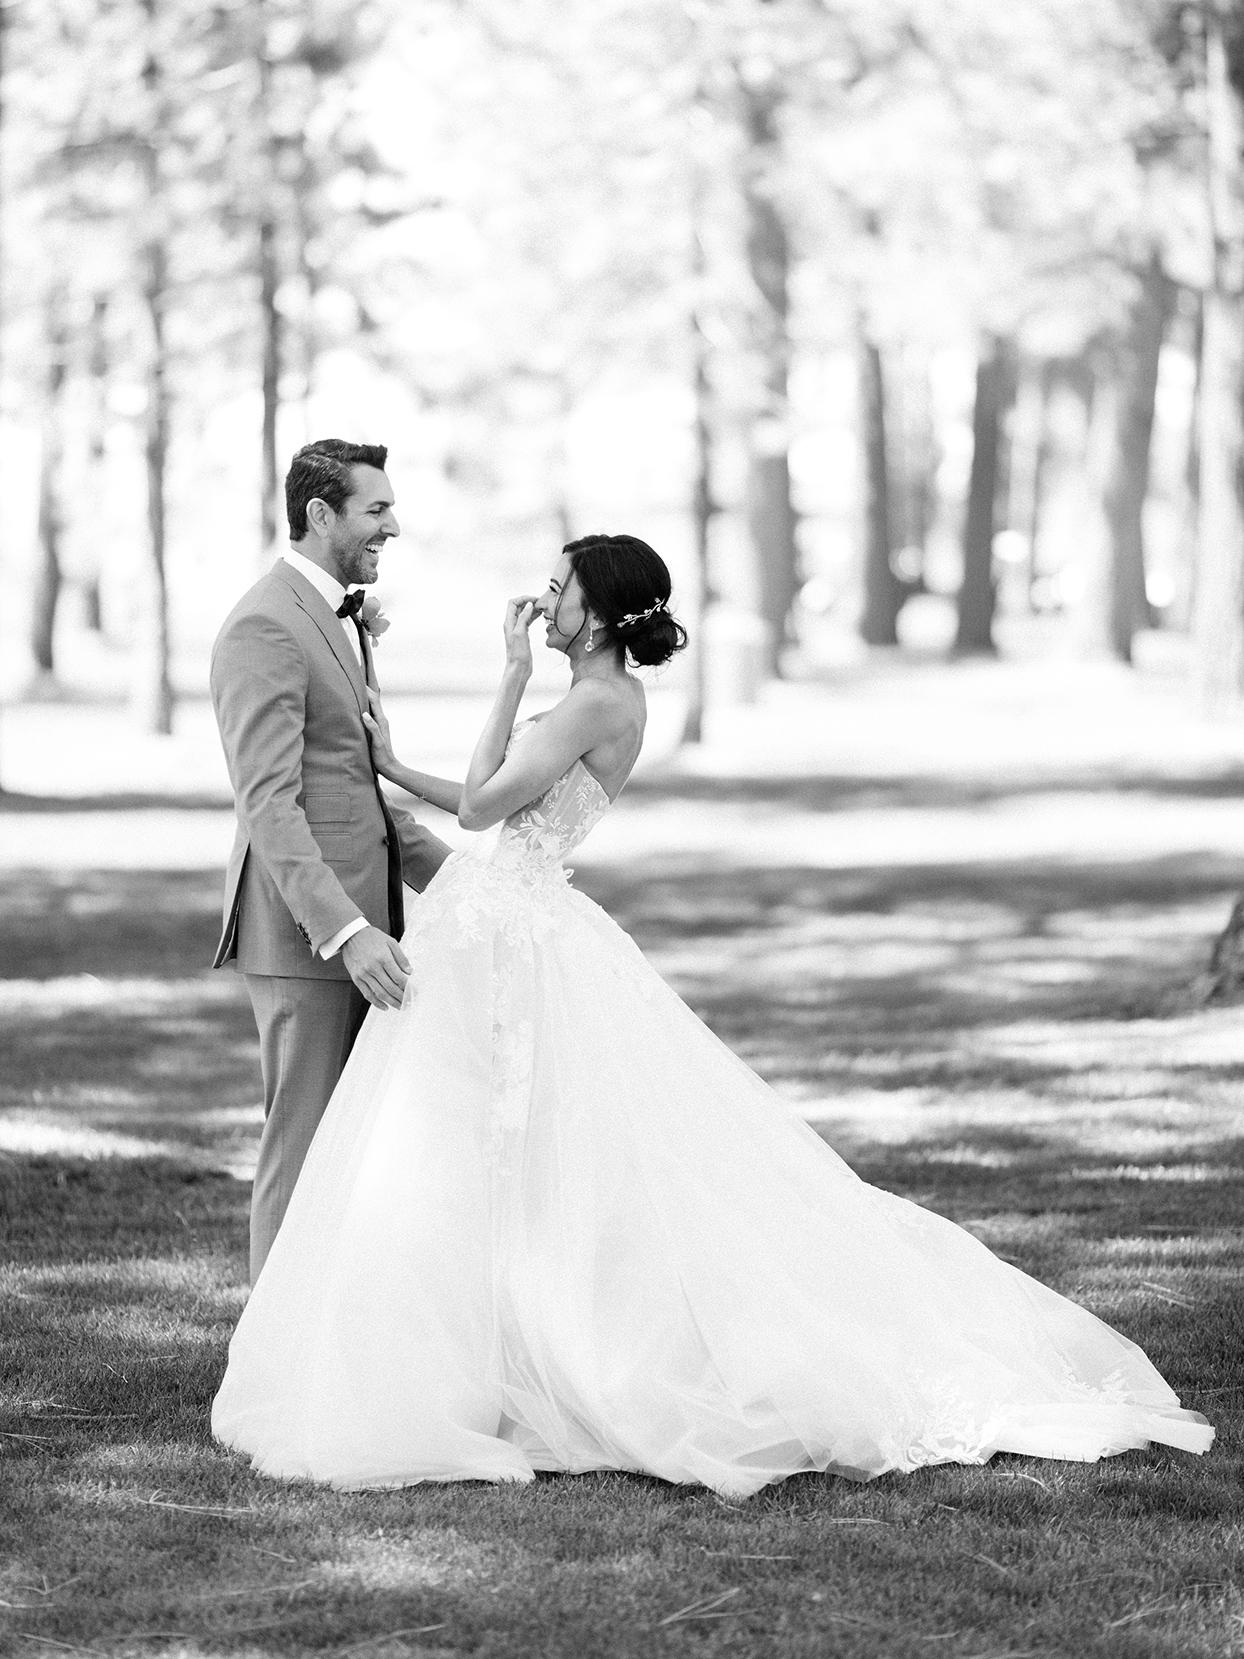 asha andrew wedding first look in field